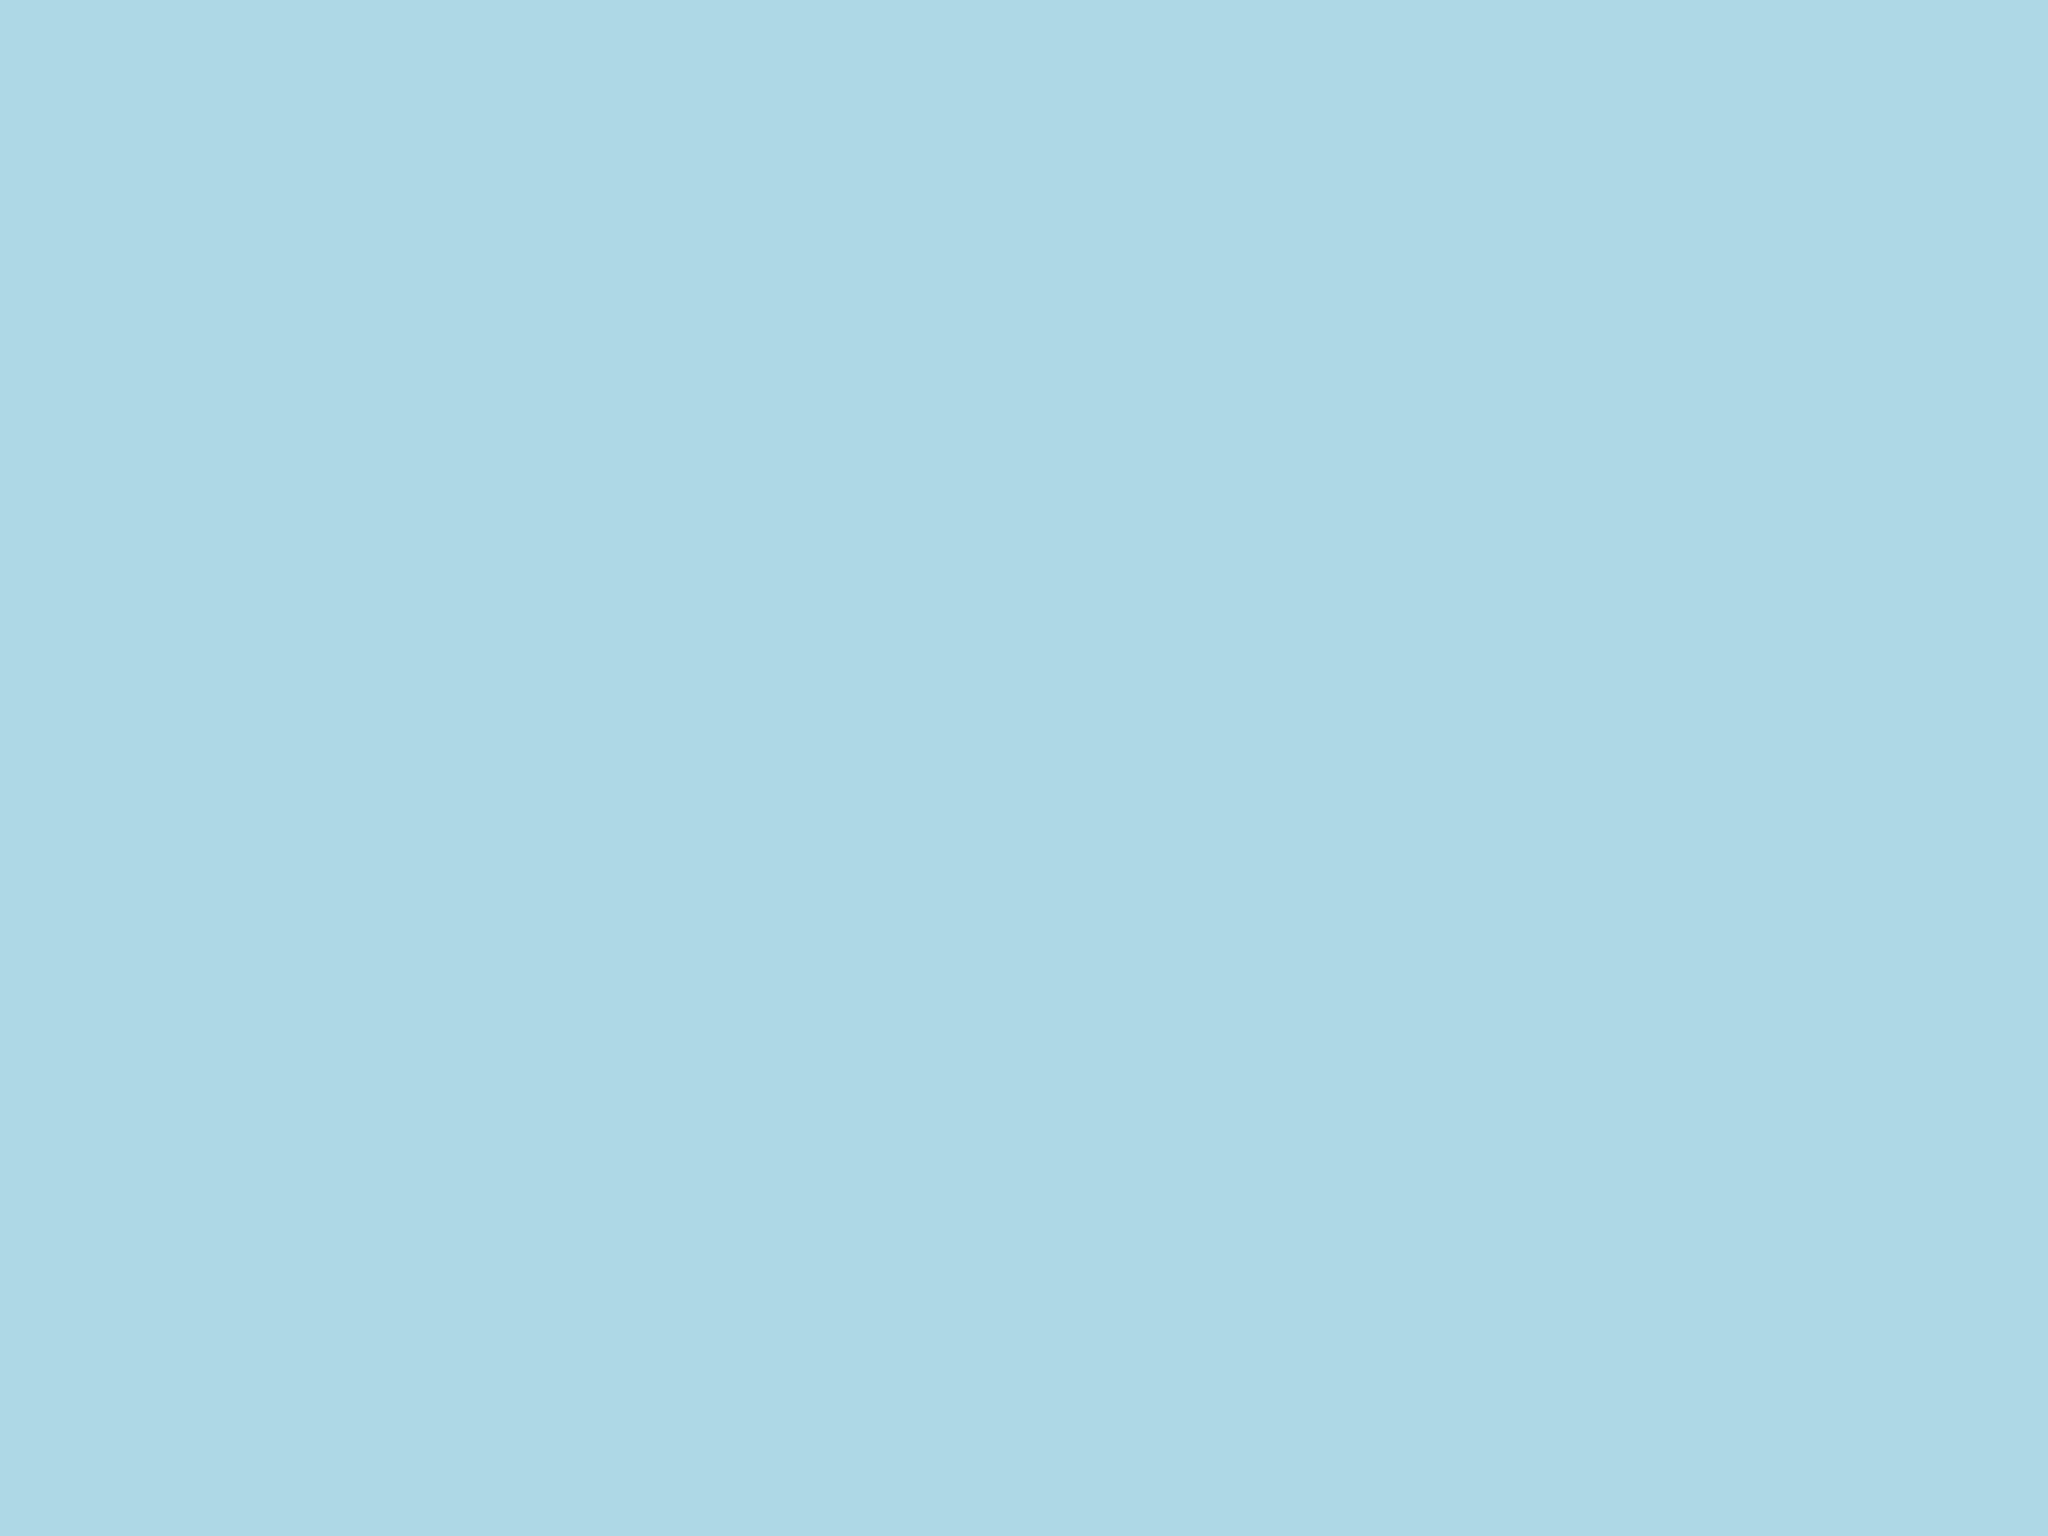 2048x1536 Light Blue Solid Color Background